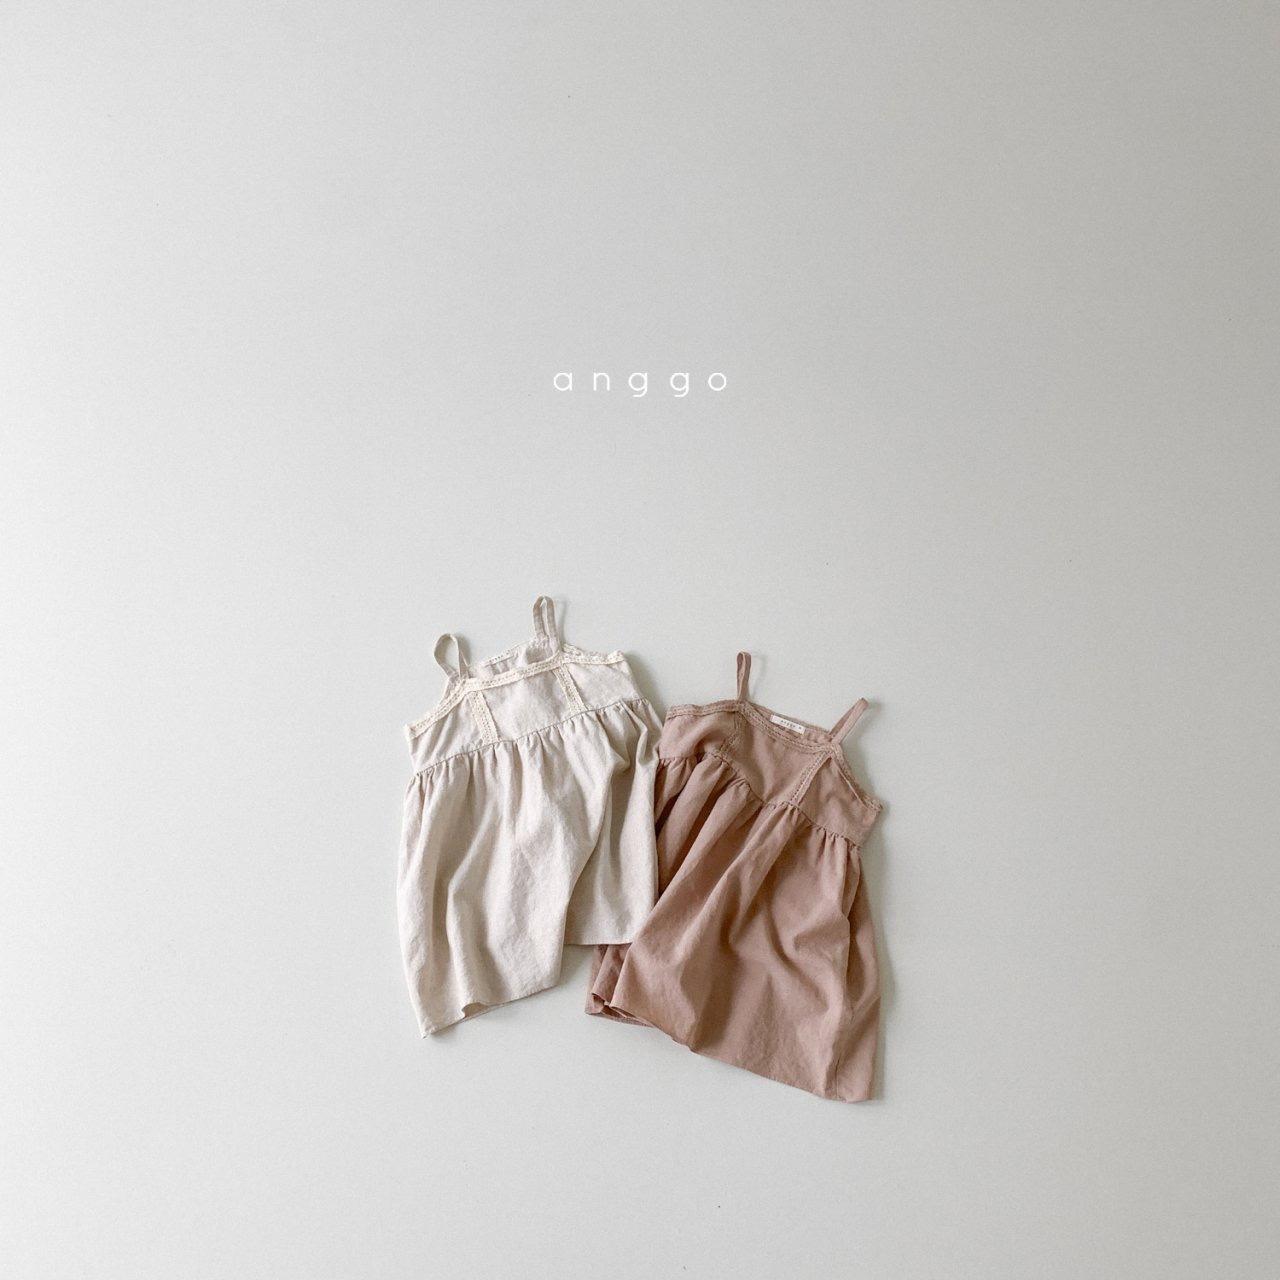 NO.1382 Kayla one-piece / anggo